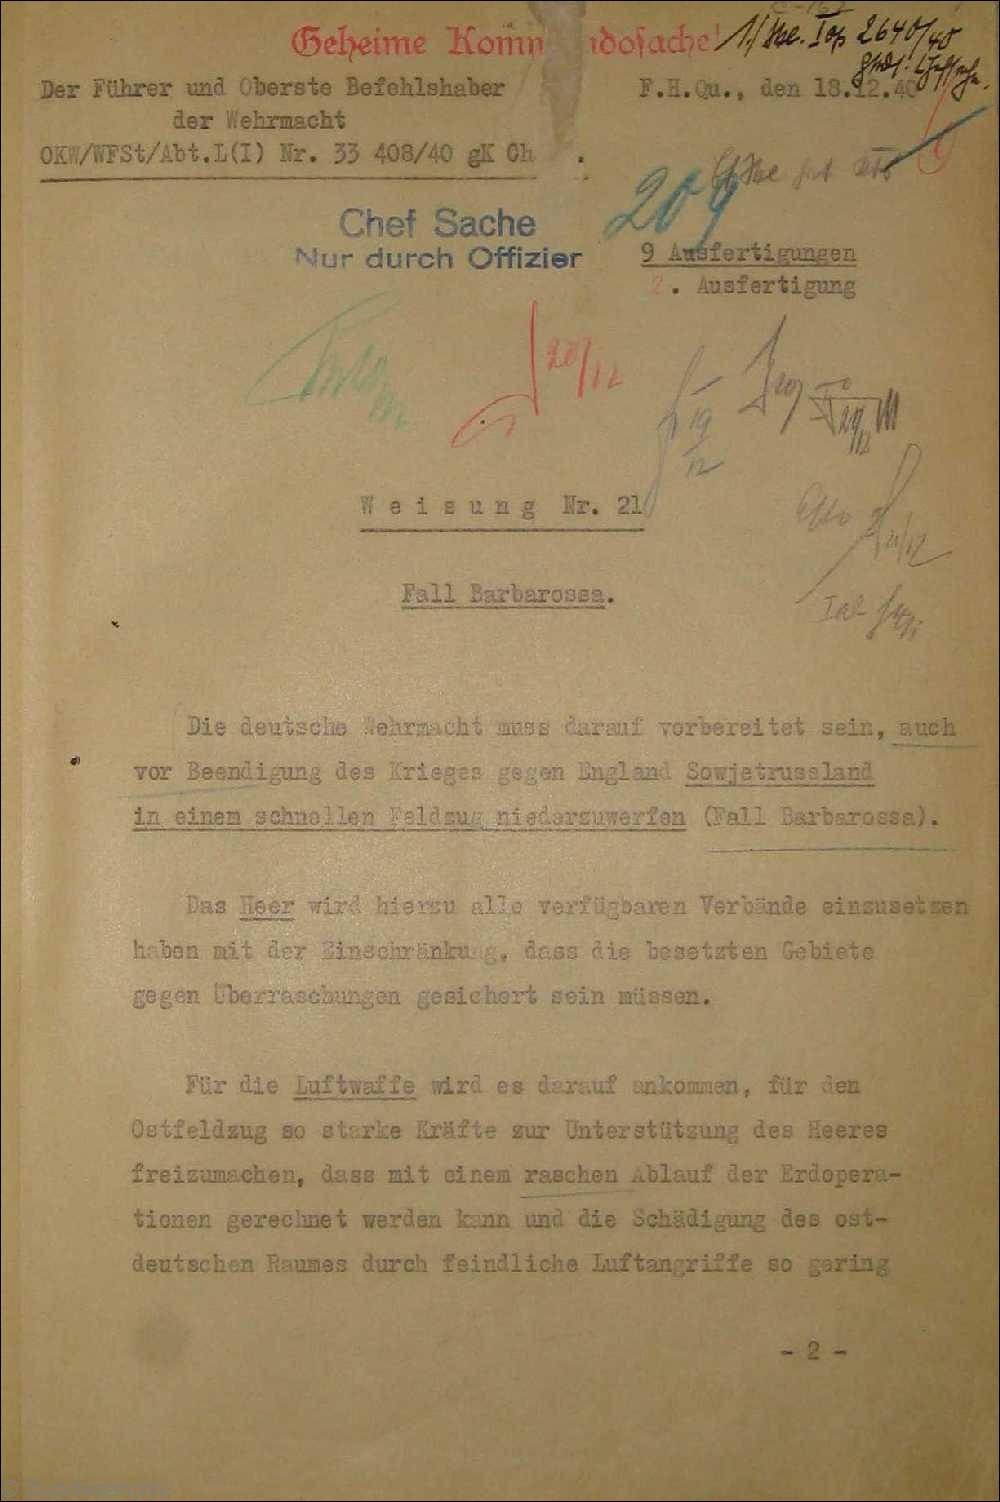 http://upload.wikimedia.org/wikipedia/commons/6/60/Fall_Barbarossa_1.jpg